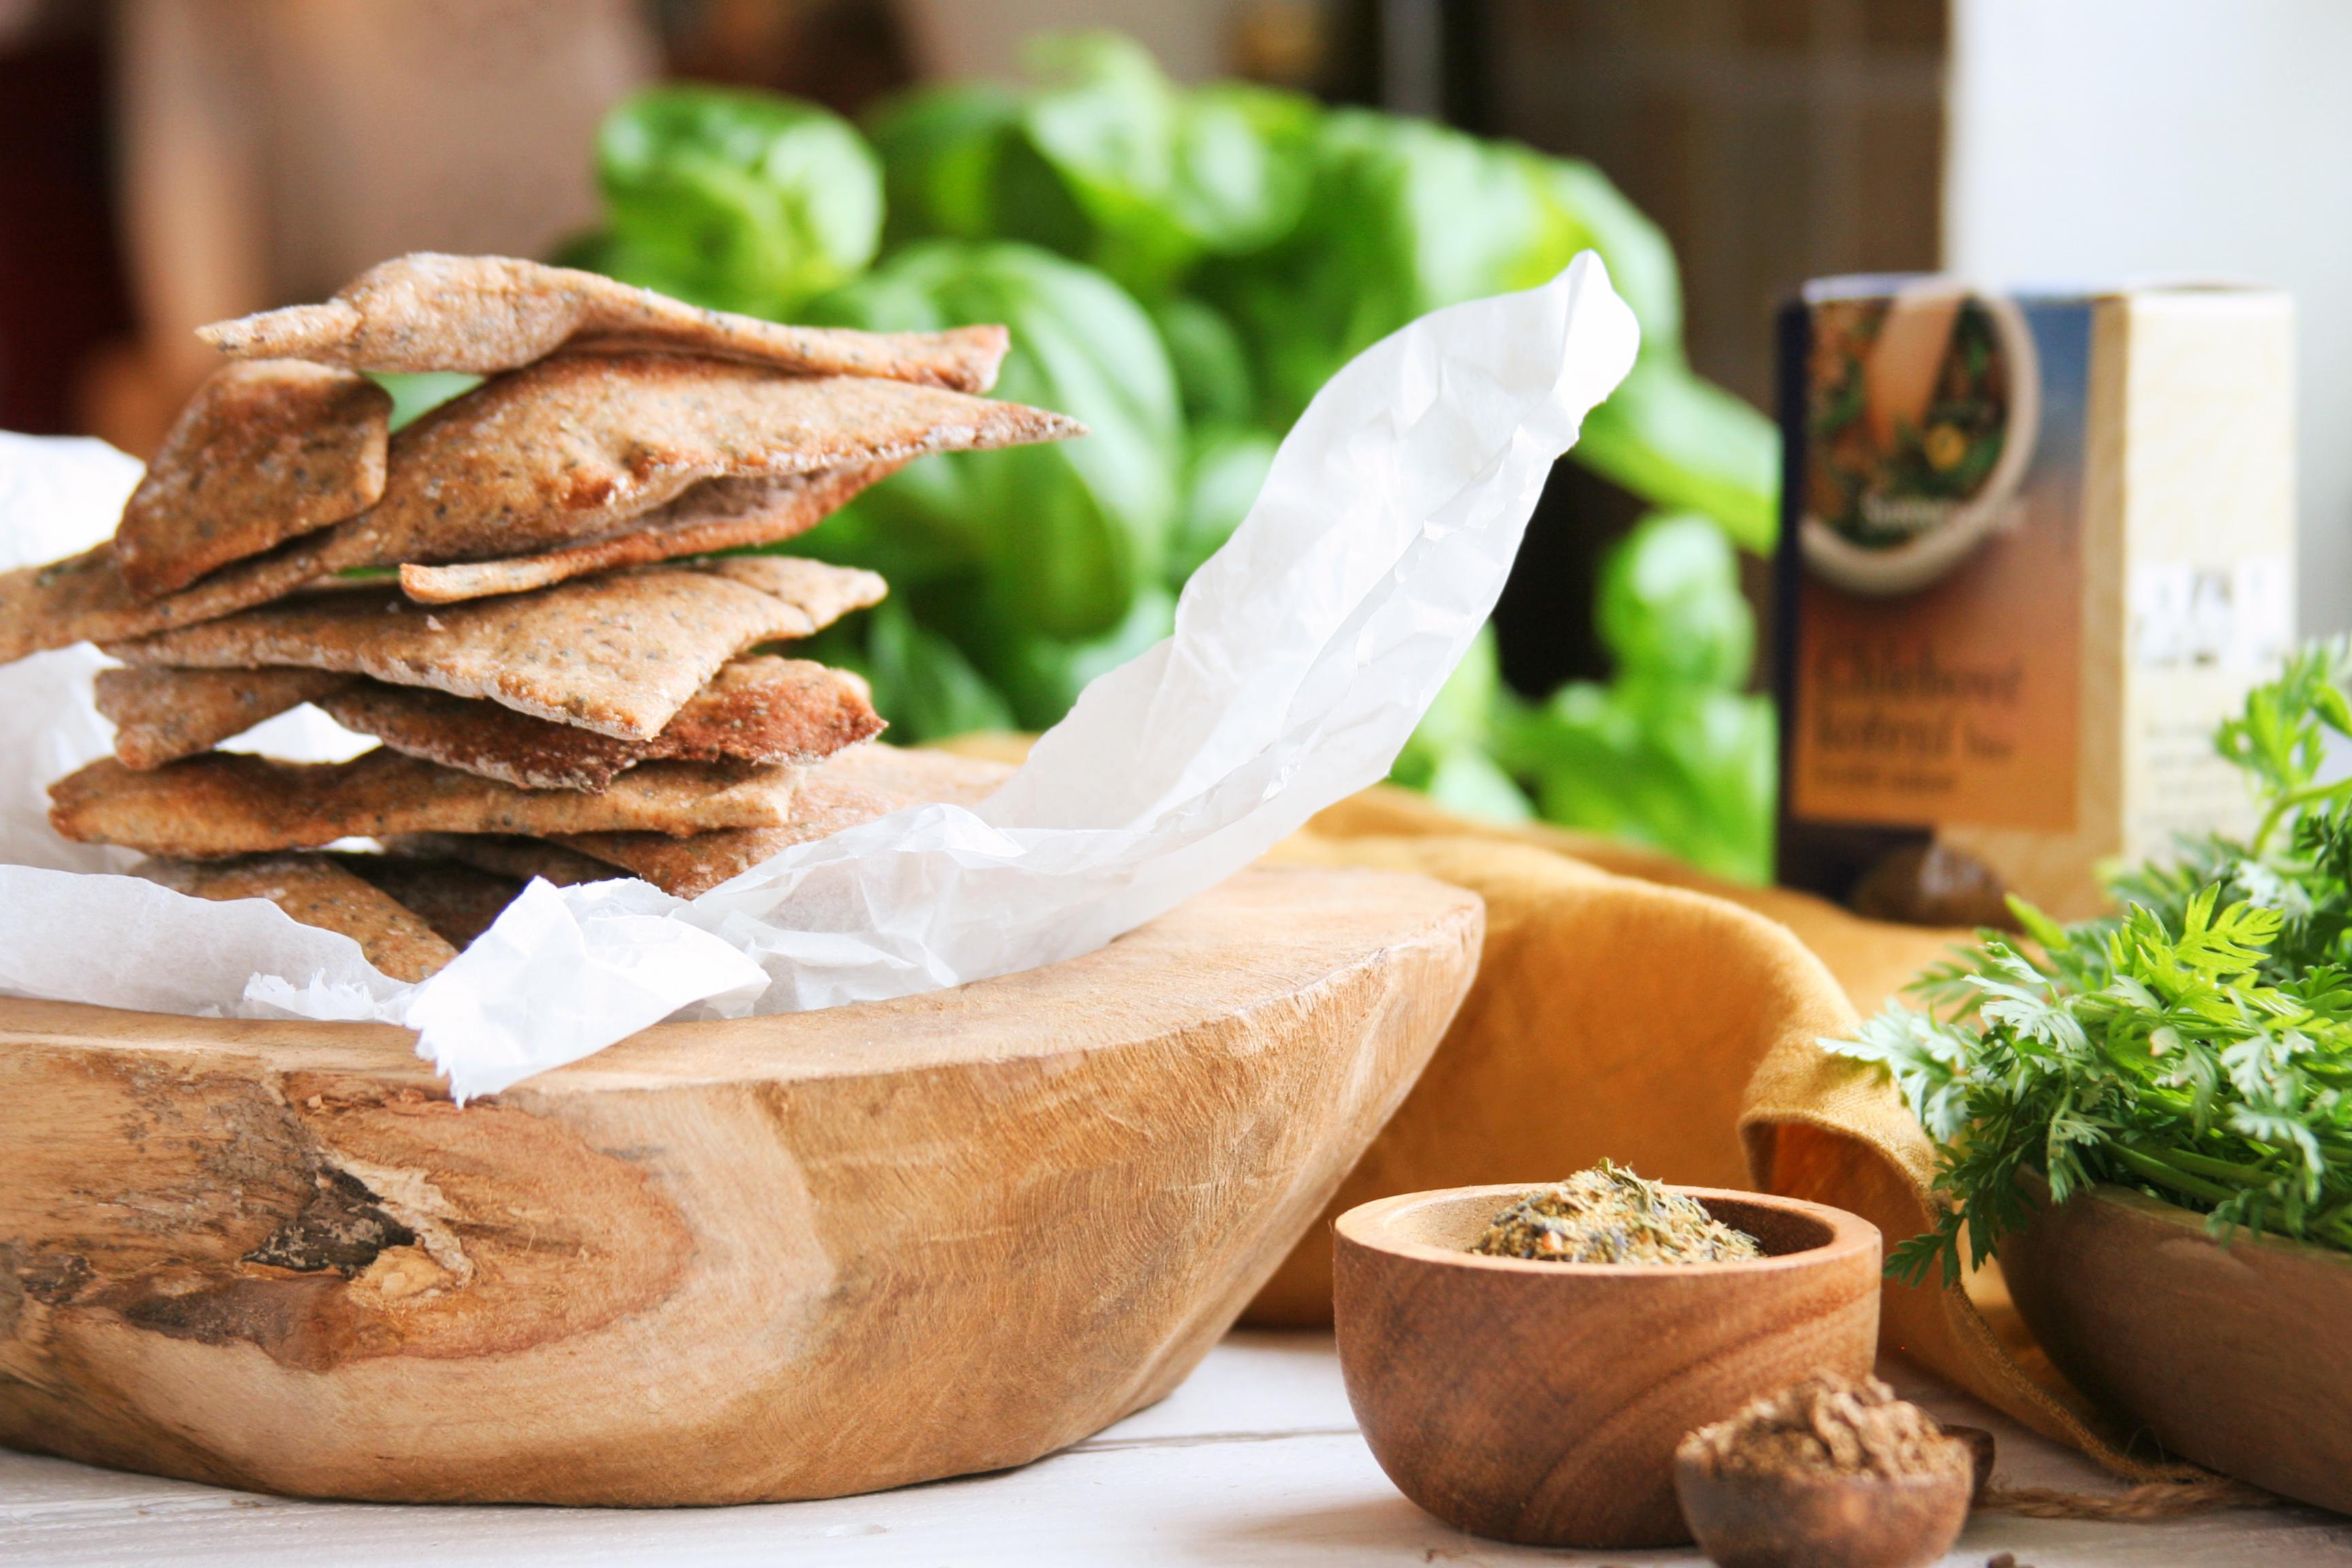 Celozrnné žitné krekry s vůní chleba